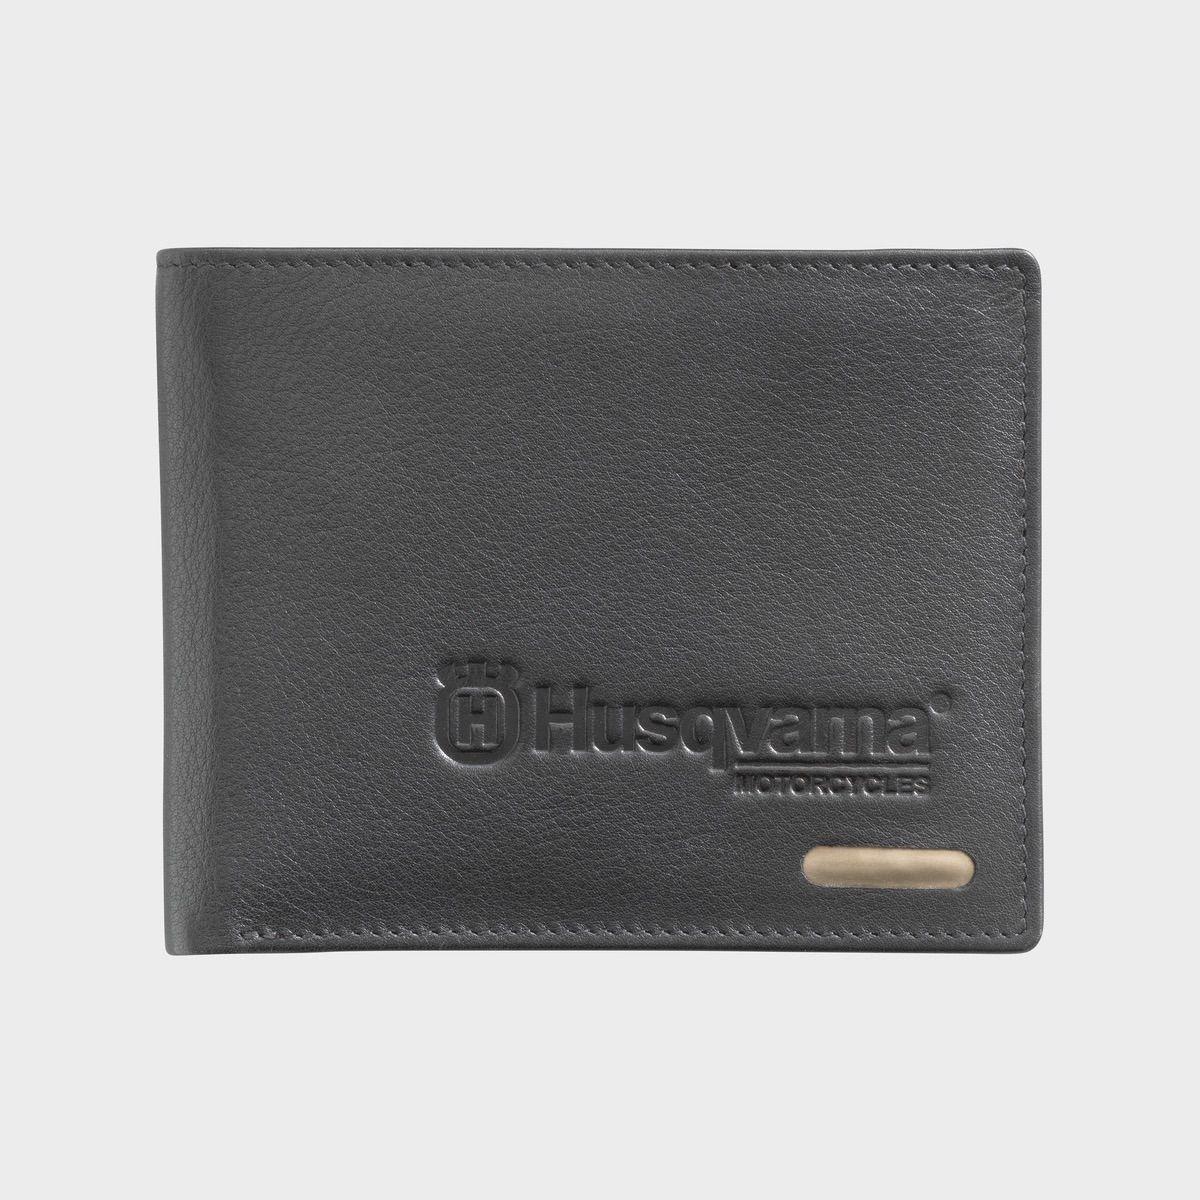 lifestyle husqvarna accesorios cartera